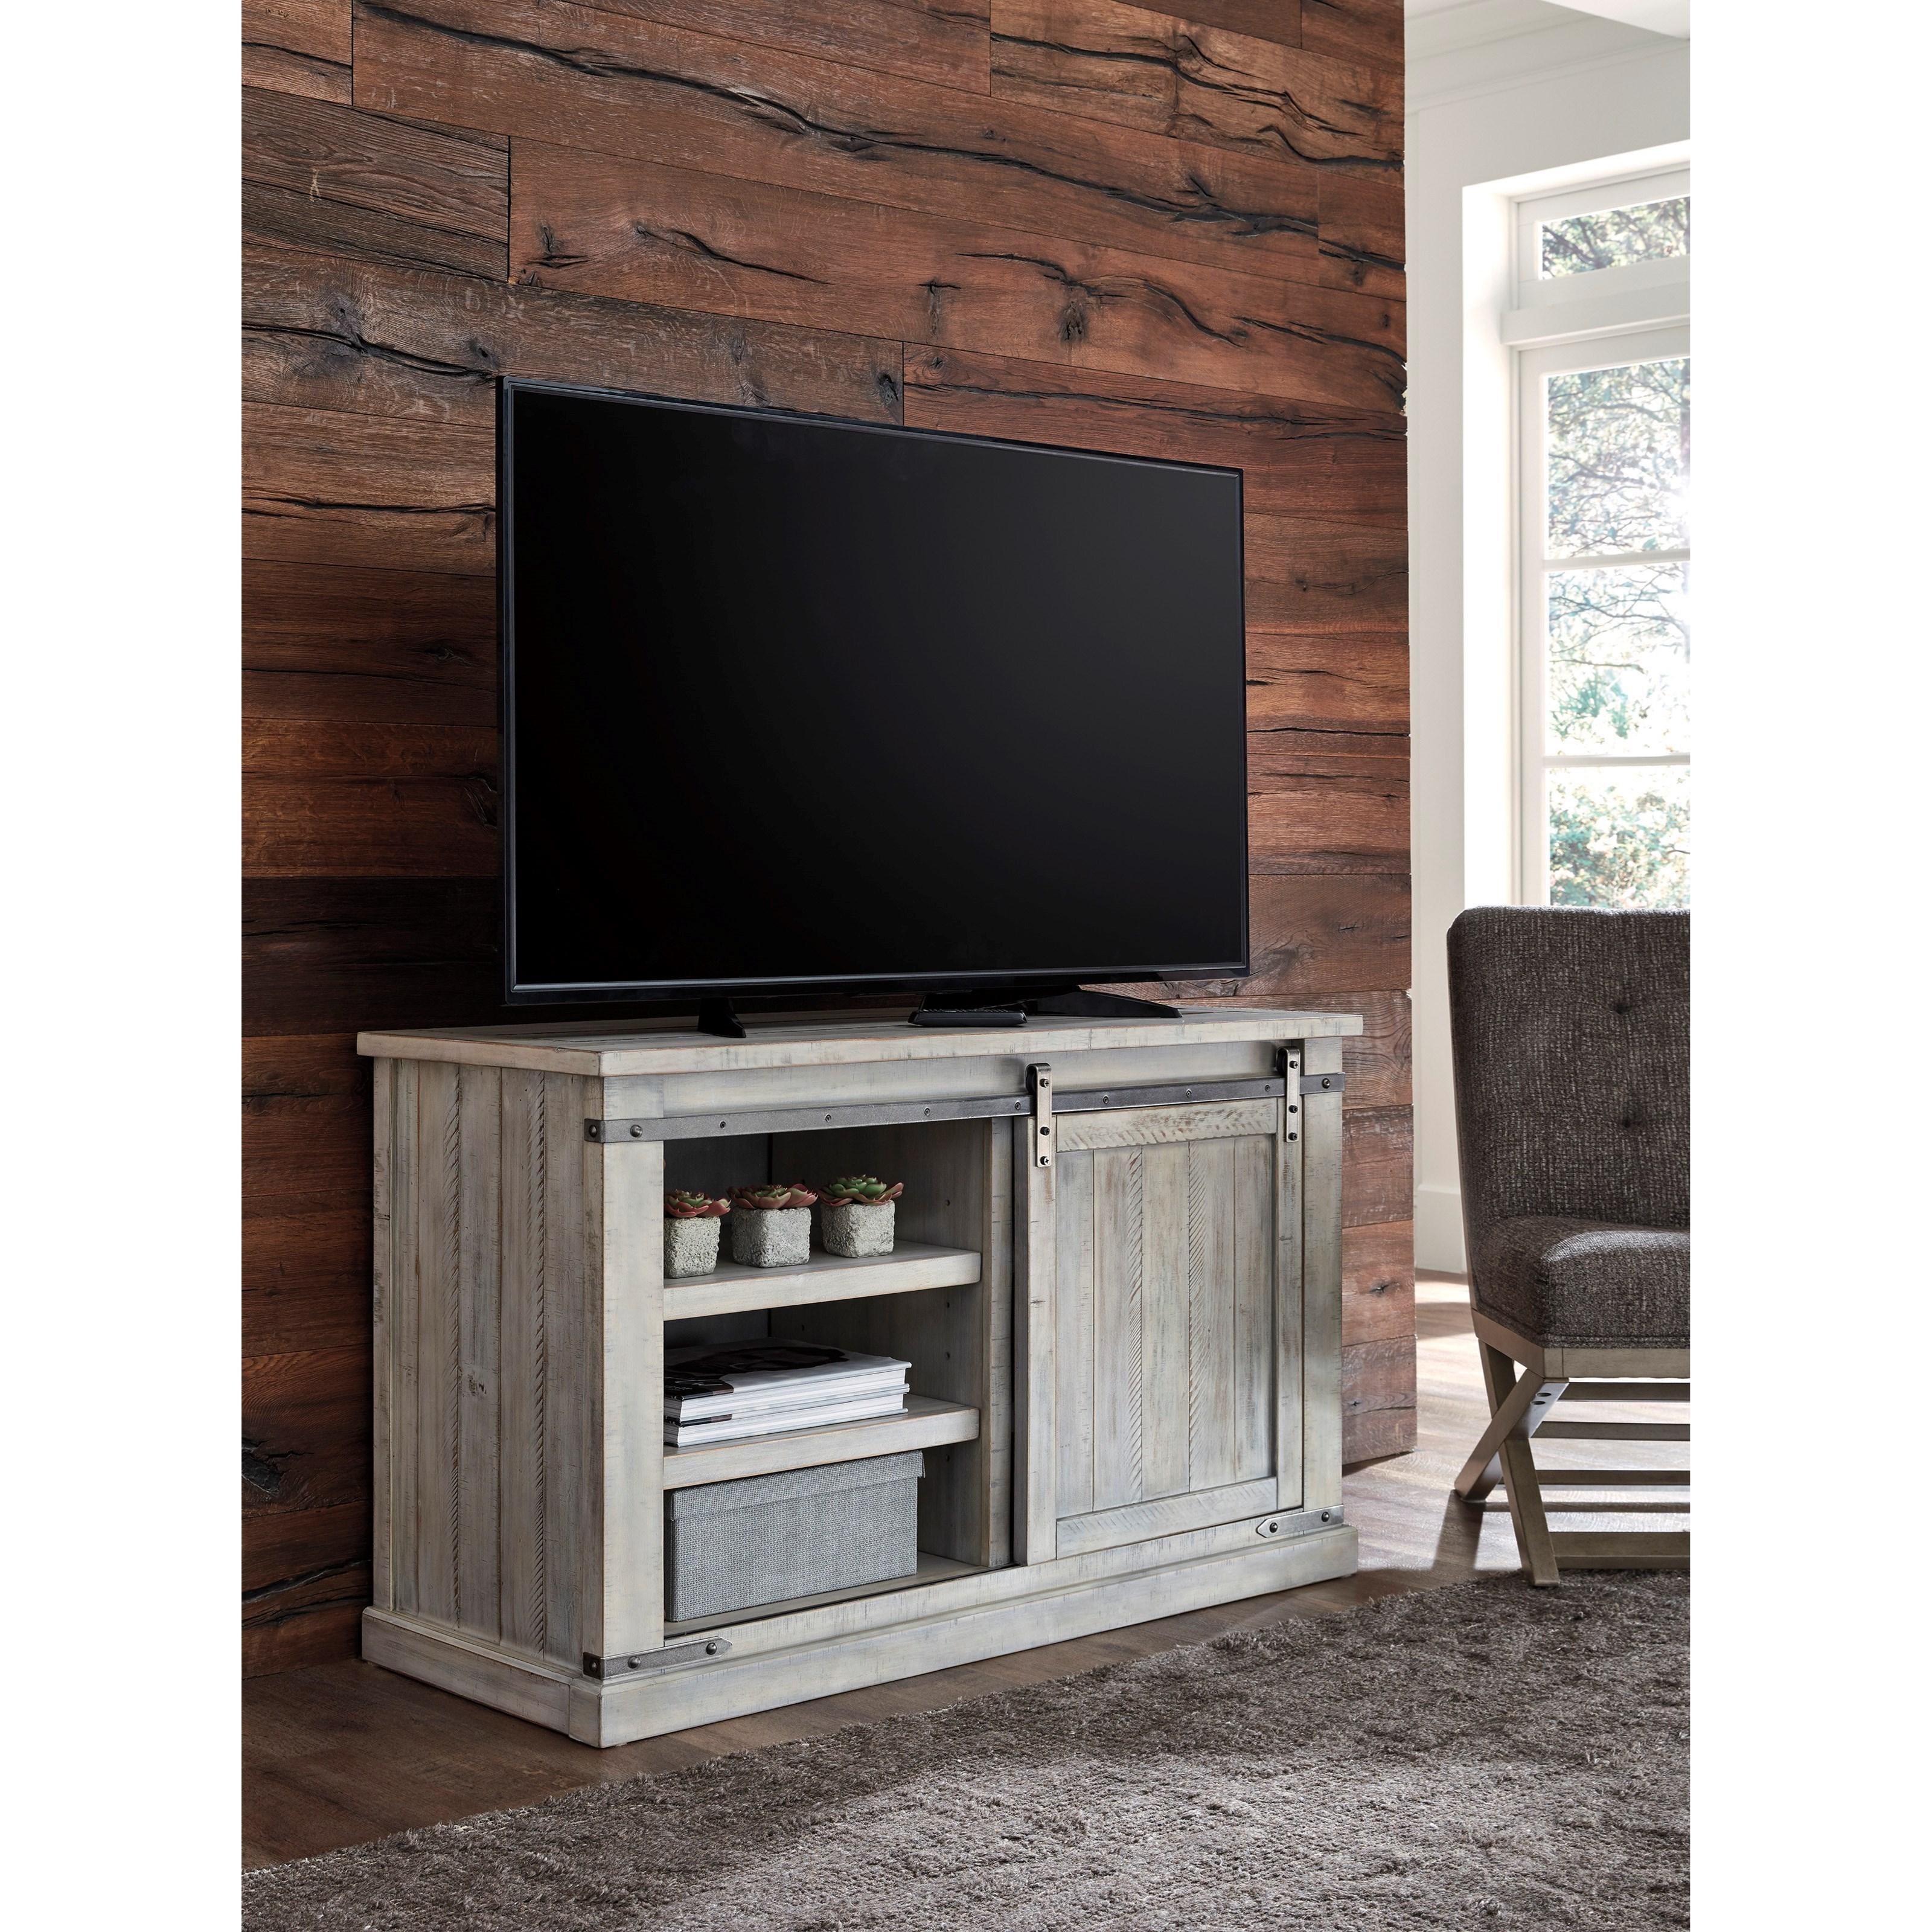 Ashley Furniture Cary Nc: Signature Design By Ashley Carynhurst W755-28 Rustic White